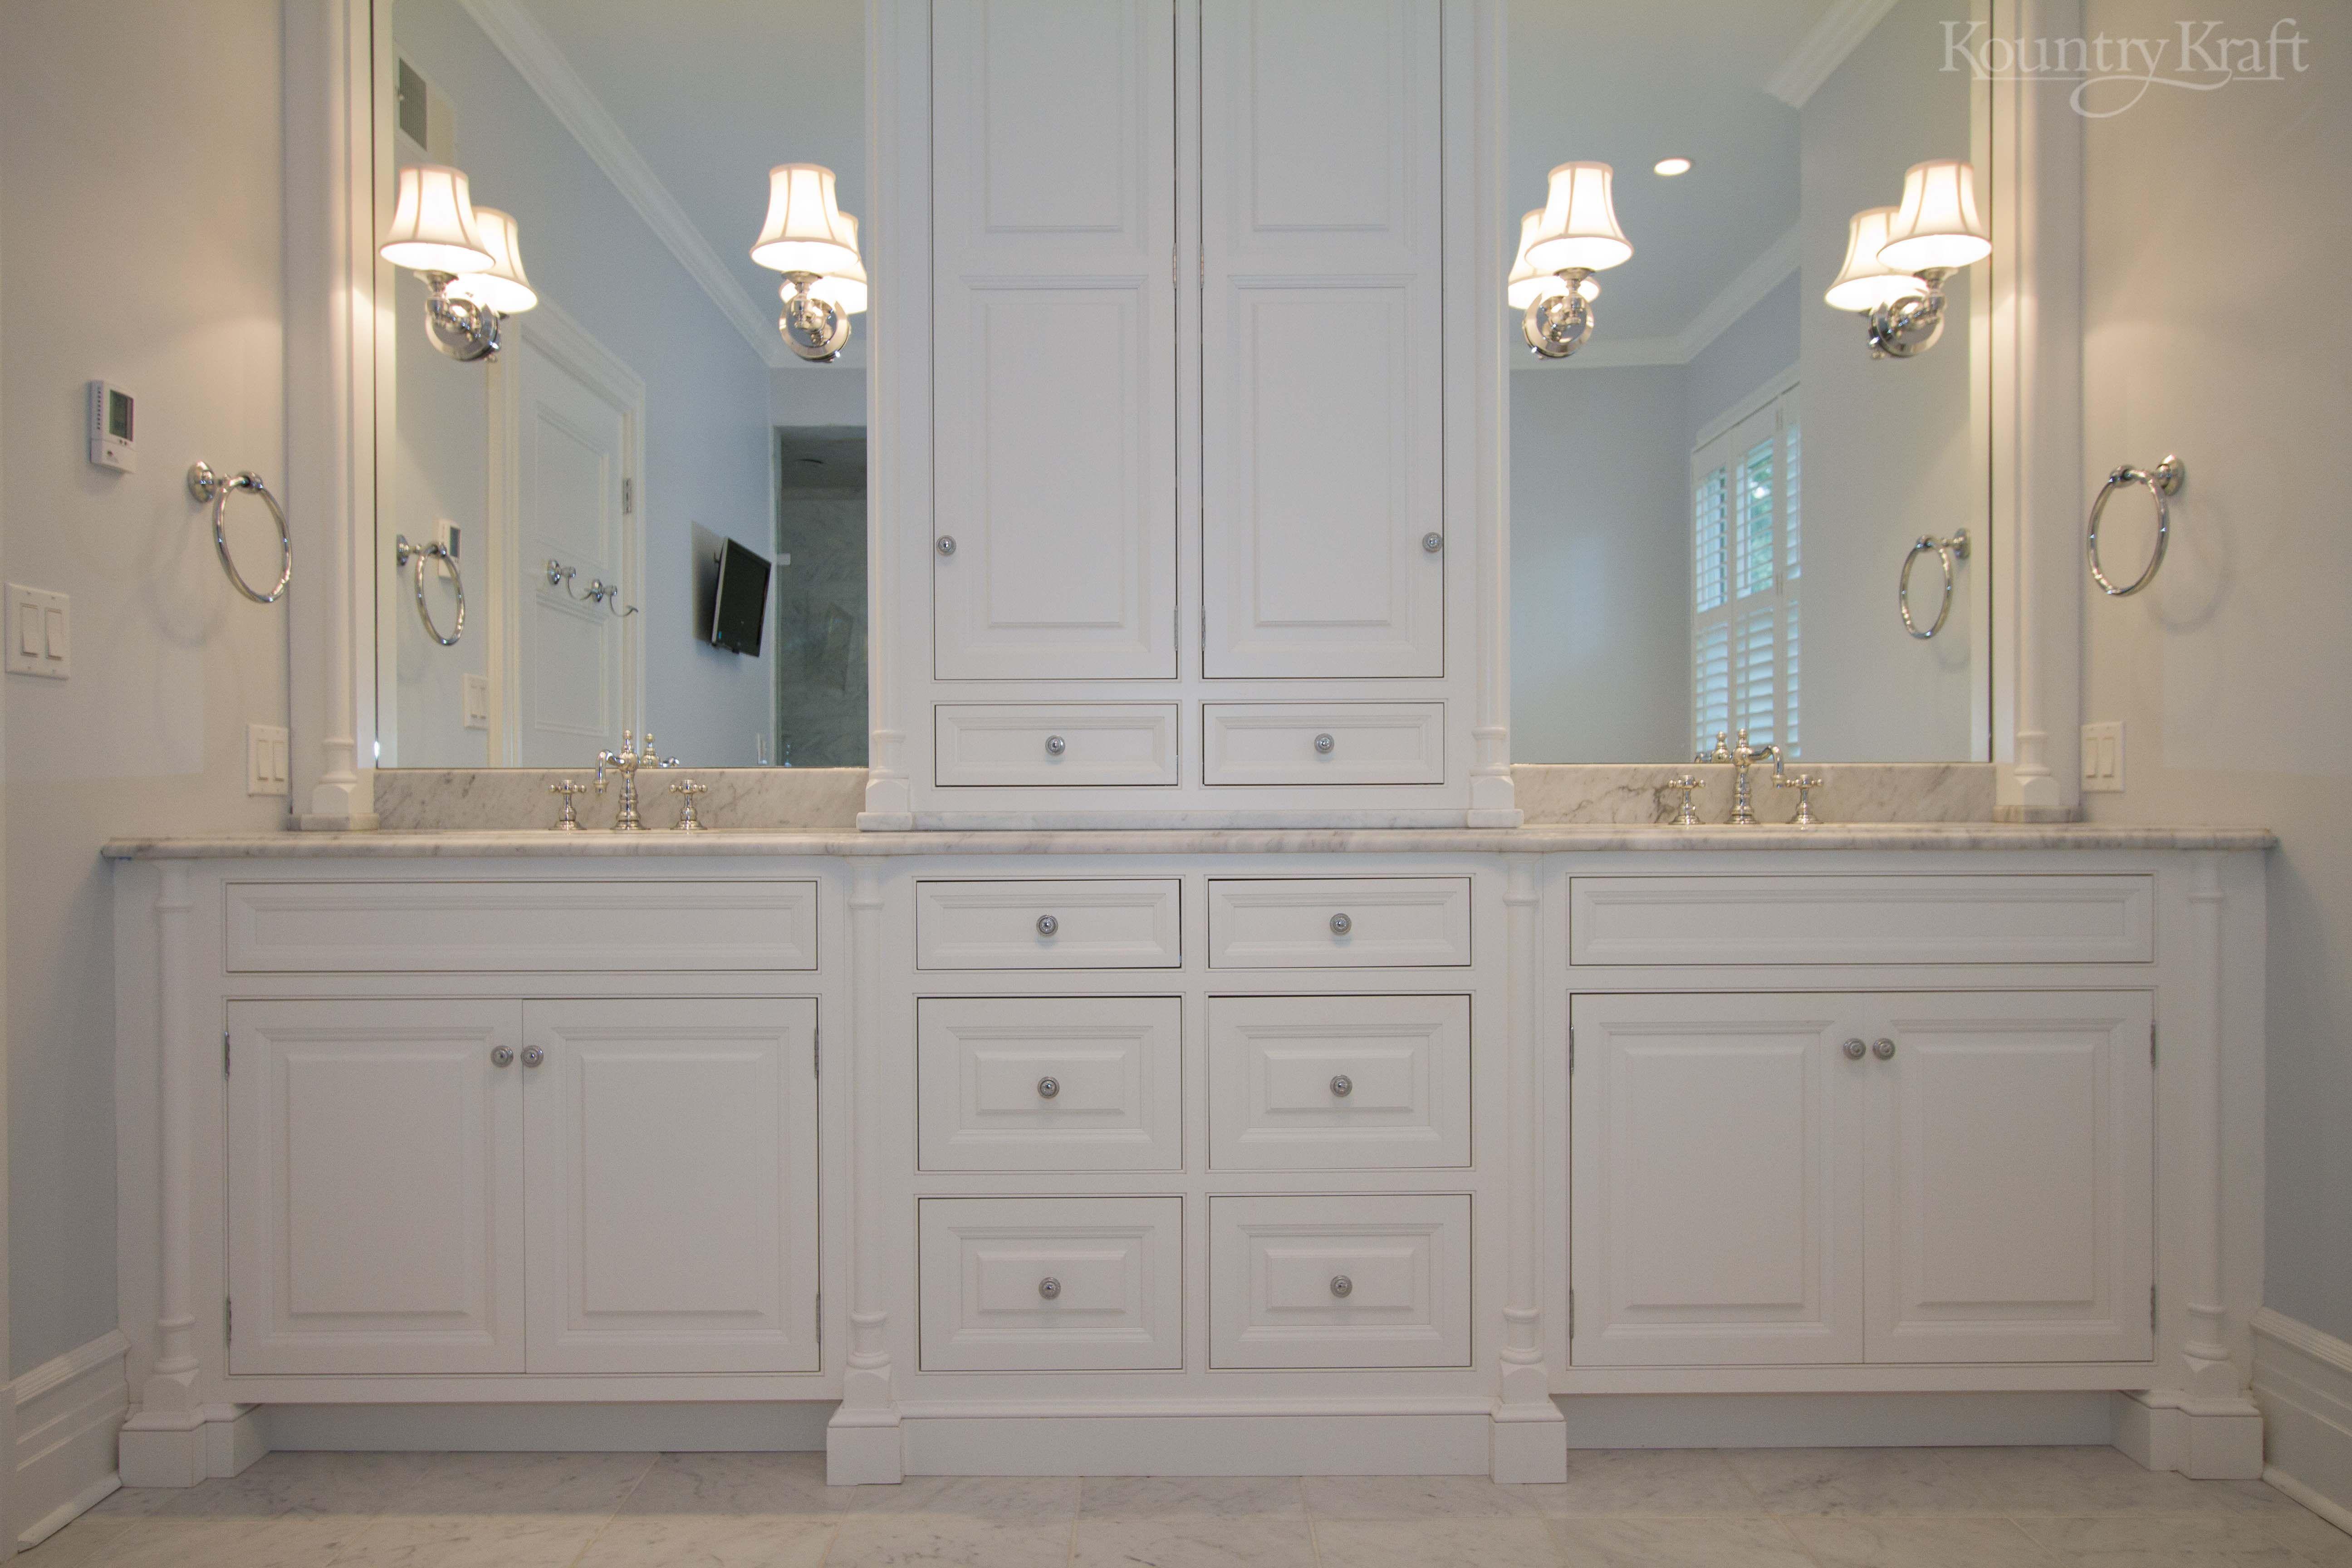 White Bathroom Cabinets In Ridgewood Nj Designed By James Kershaw Associates White Bathroom Cabinets Custom Bathroom Vanity Bathroom Cabinets